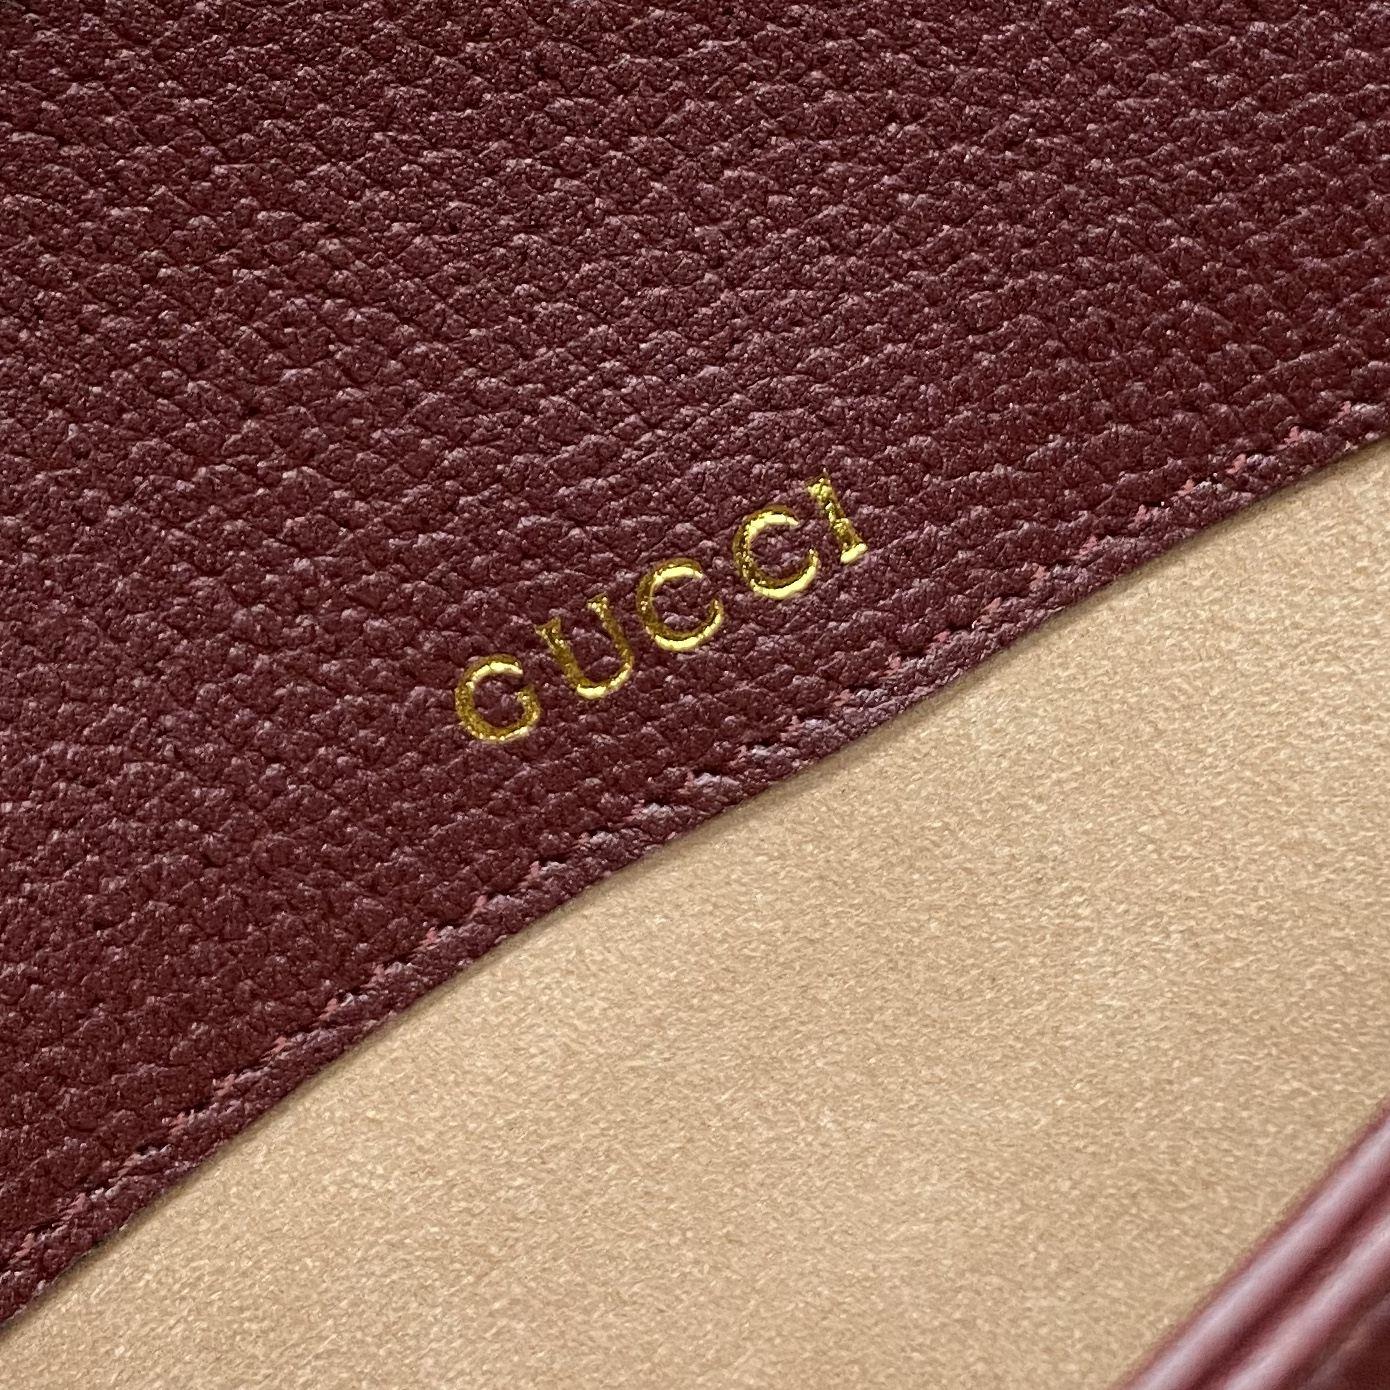 【P1430】Gucci秋冬新款女包 古驰1955新色酒红gg帆布马鞍包单肩斜挎包